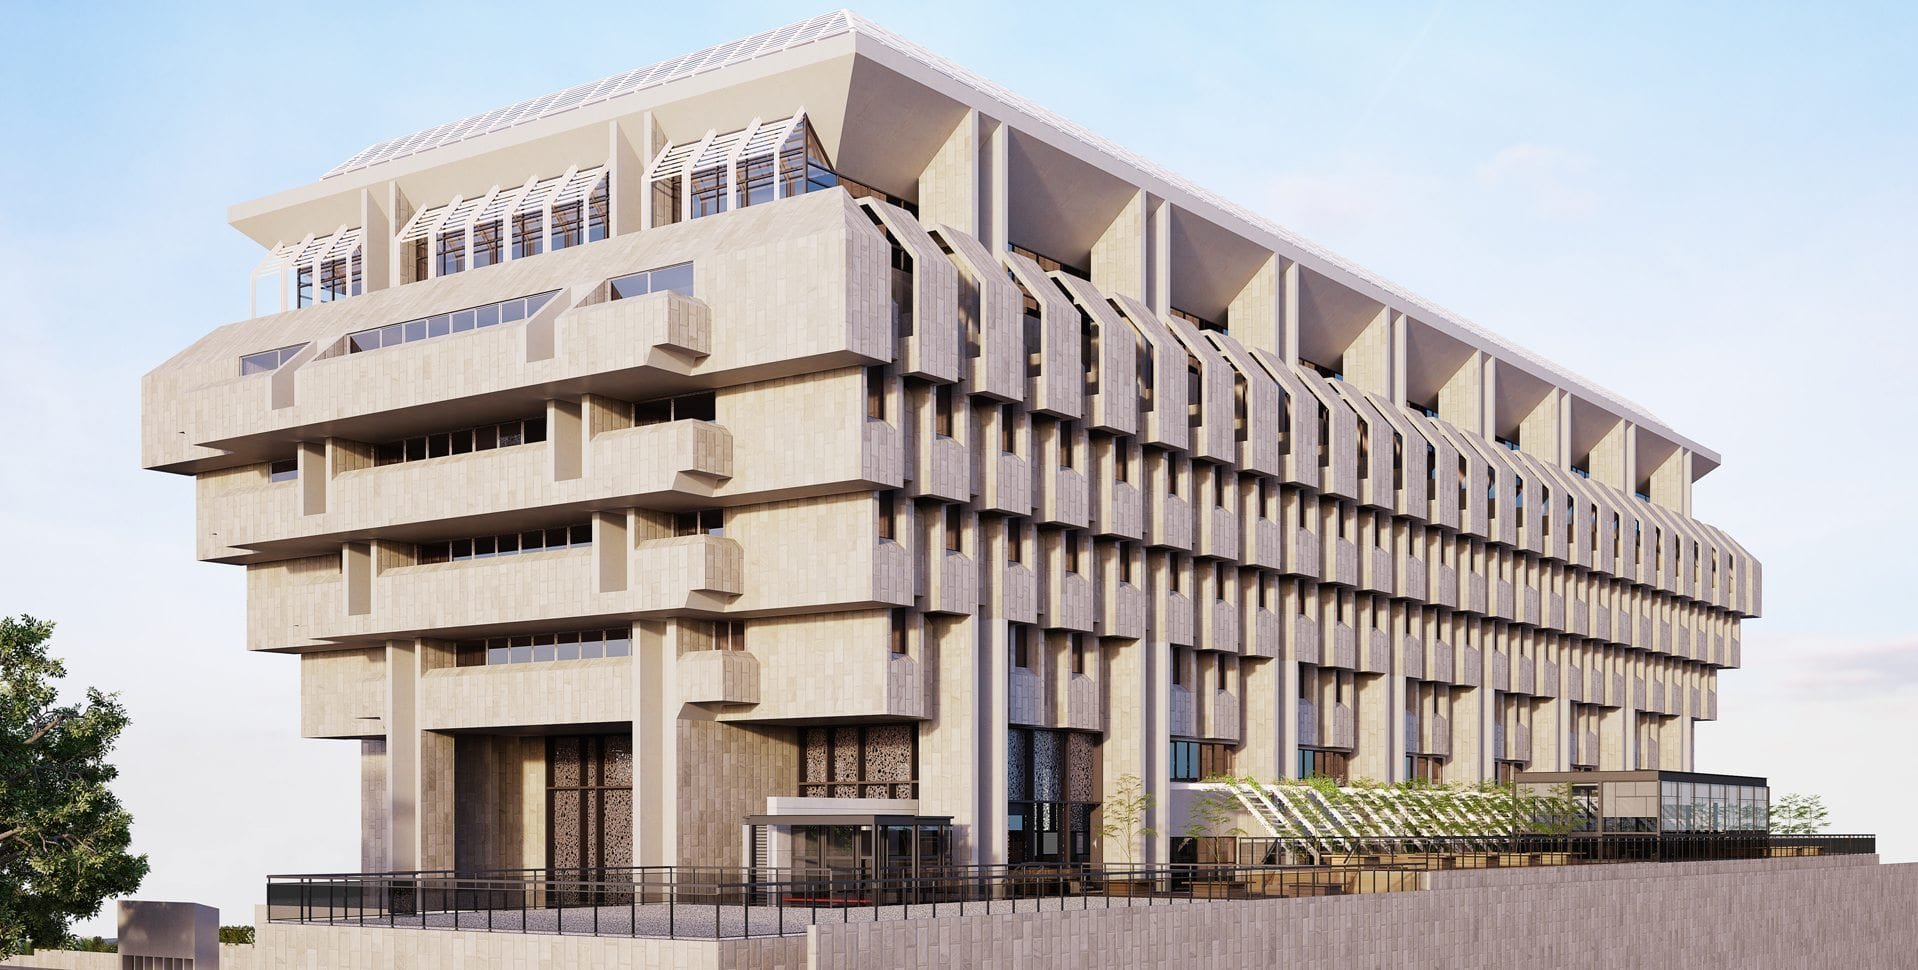 Maayan-Golan_Architectural-Visualization_exterior-visualization_bank-of-israel-jerusalem_back-elevation_dunski-architects_05